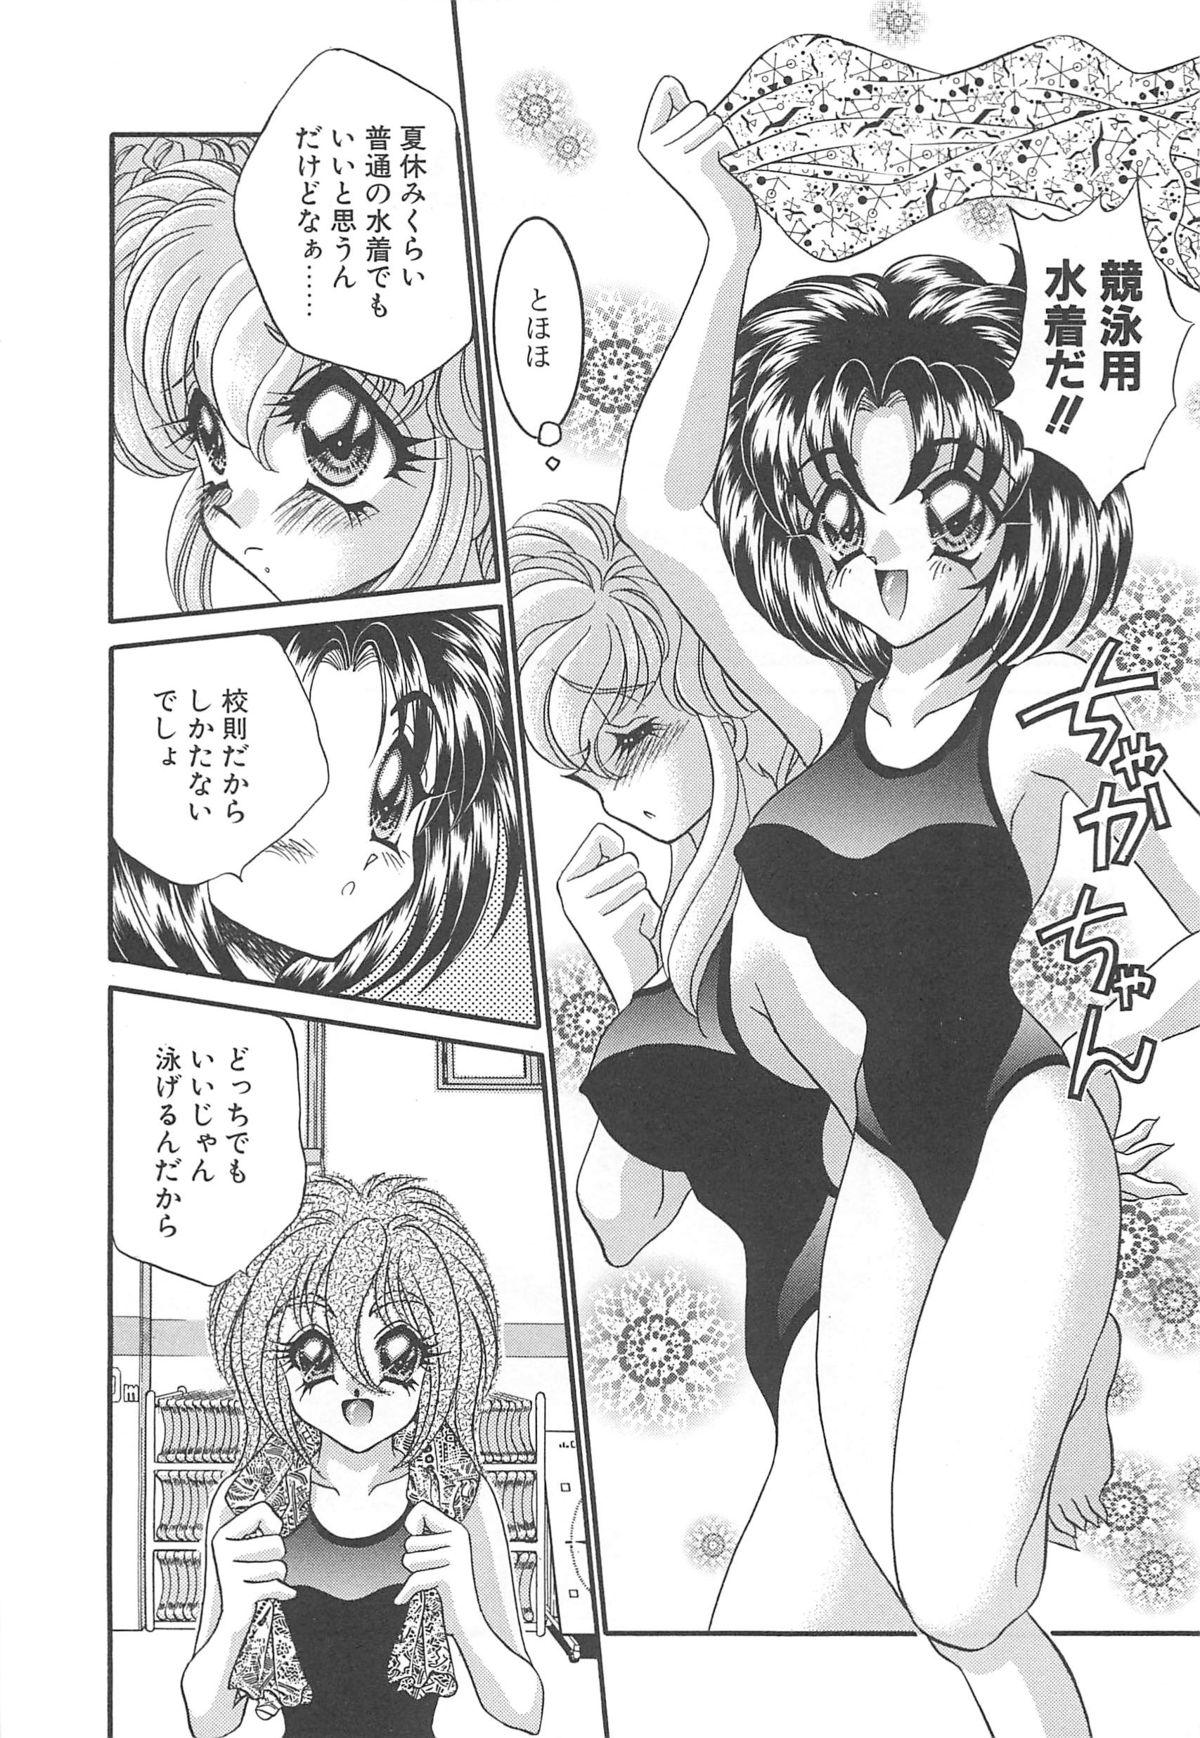 Kigurumi Sentai Quiltian 24